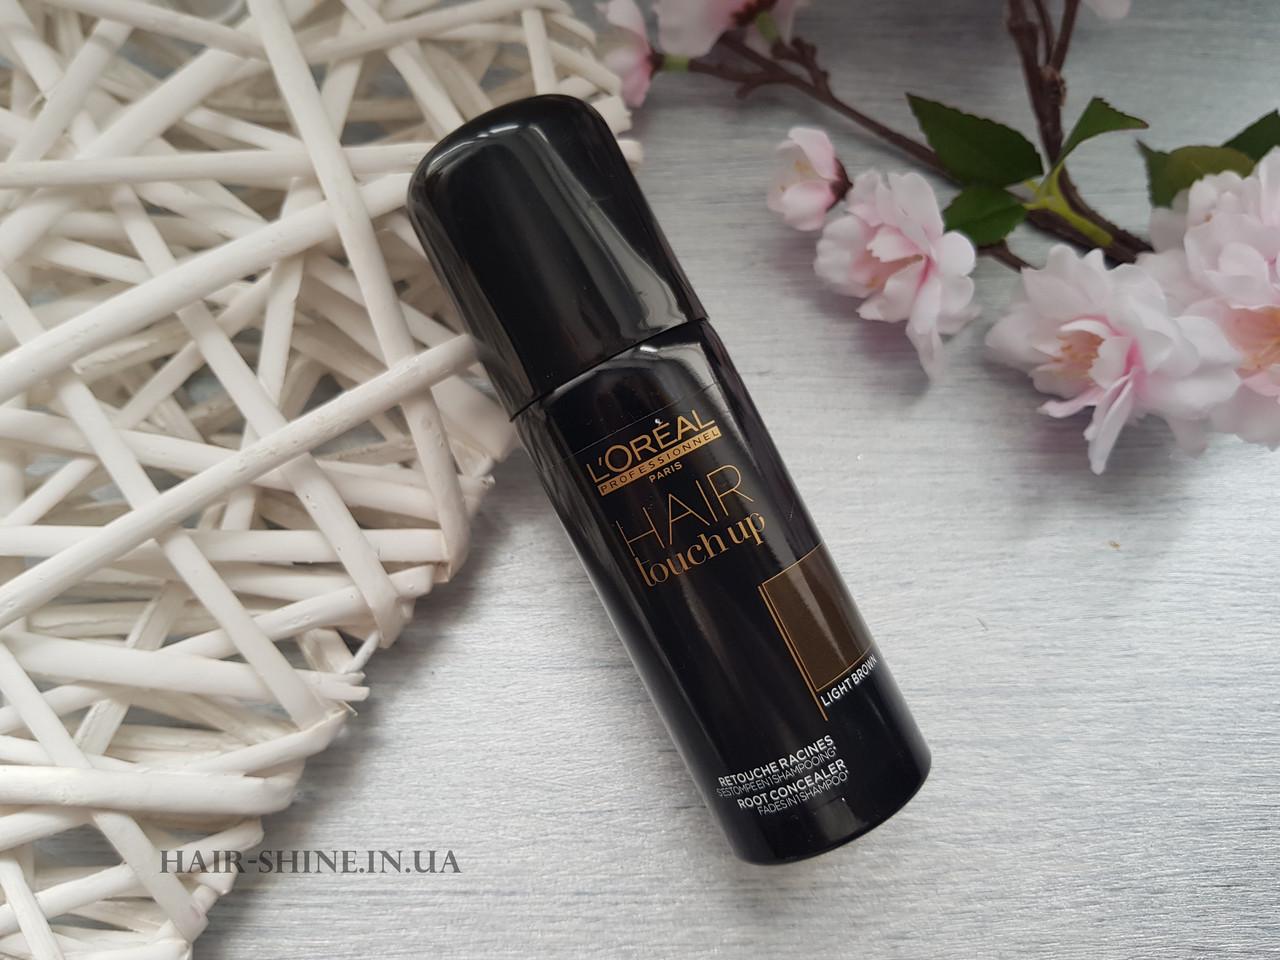 Консилер для волос - L'Oreal Professionnel Hair Touch UpLight Brown - светло коричневый 75 мл.